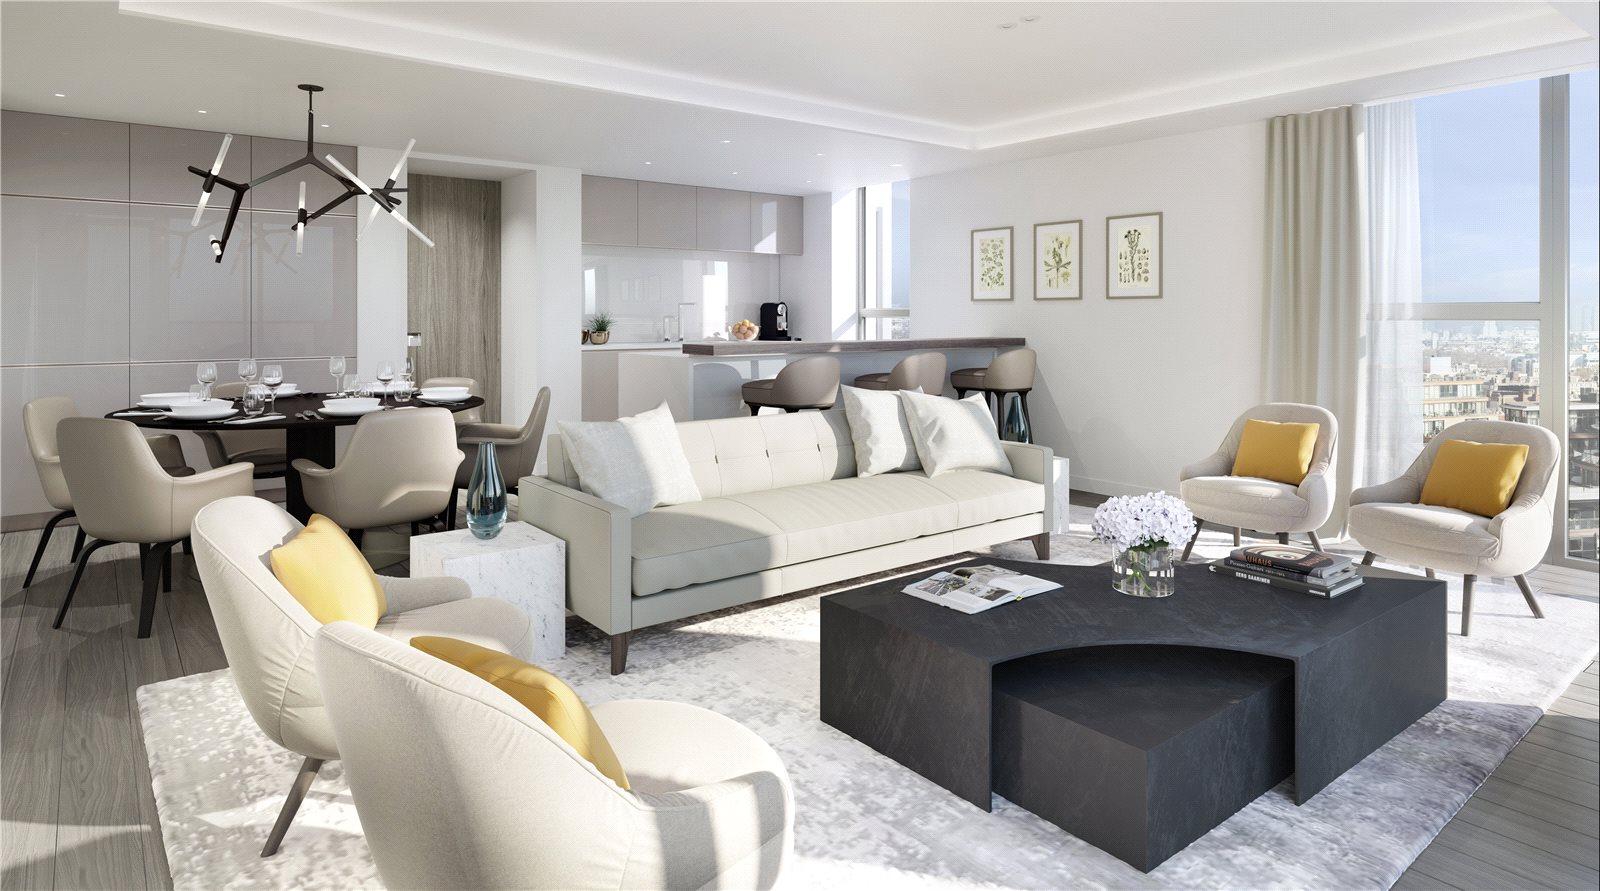 Additional photo for property listing at Paddington Gardens, North Wharf Road, London, W2 London, 英格蘭